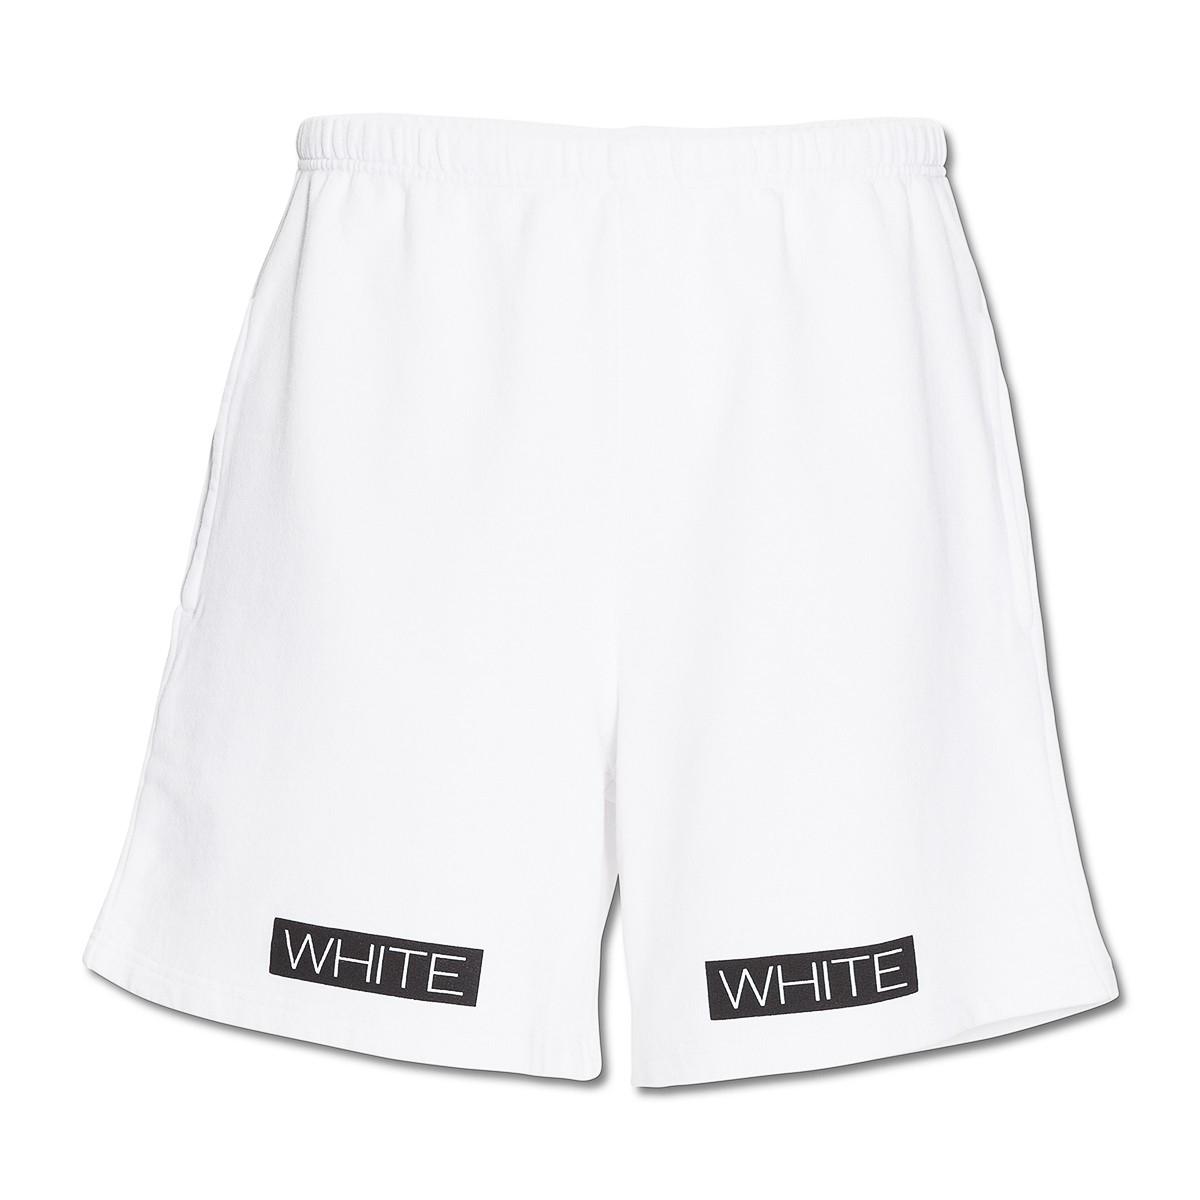 Off-white c/o virgil abloh Orange Box Shorts in Orange for Men | Lyst